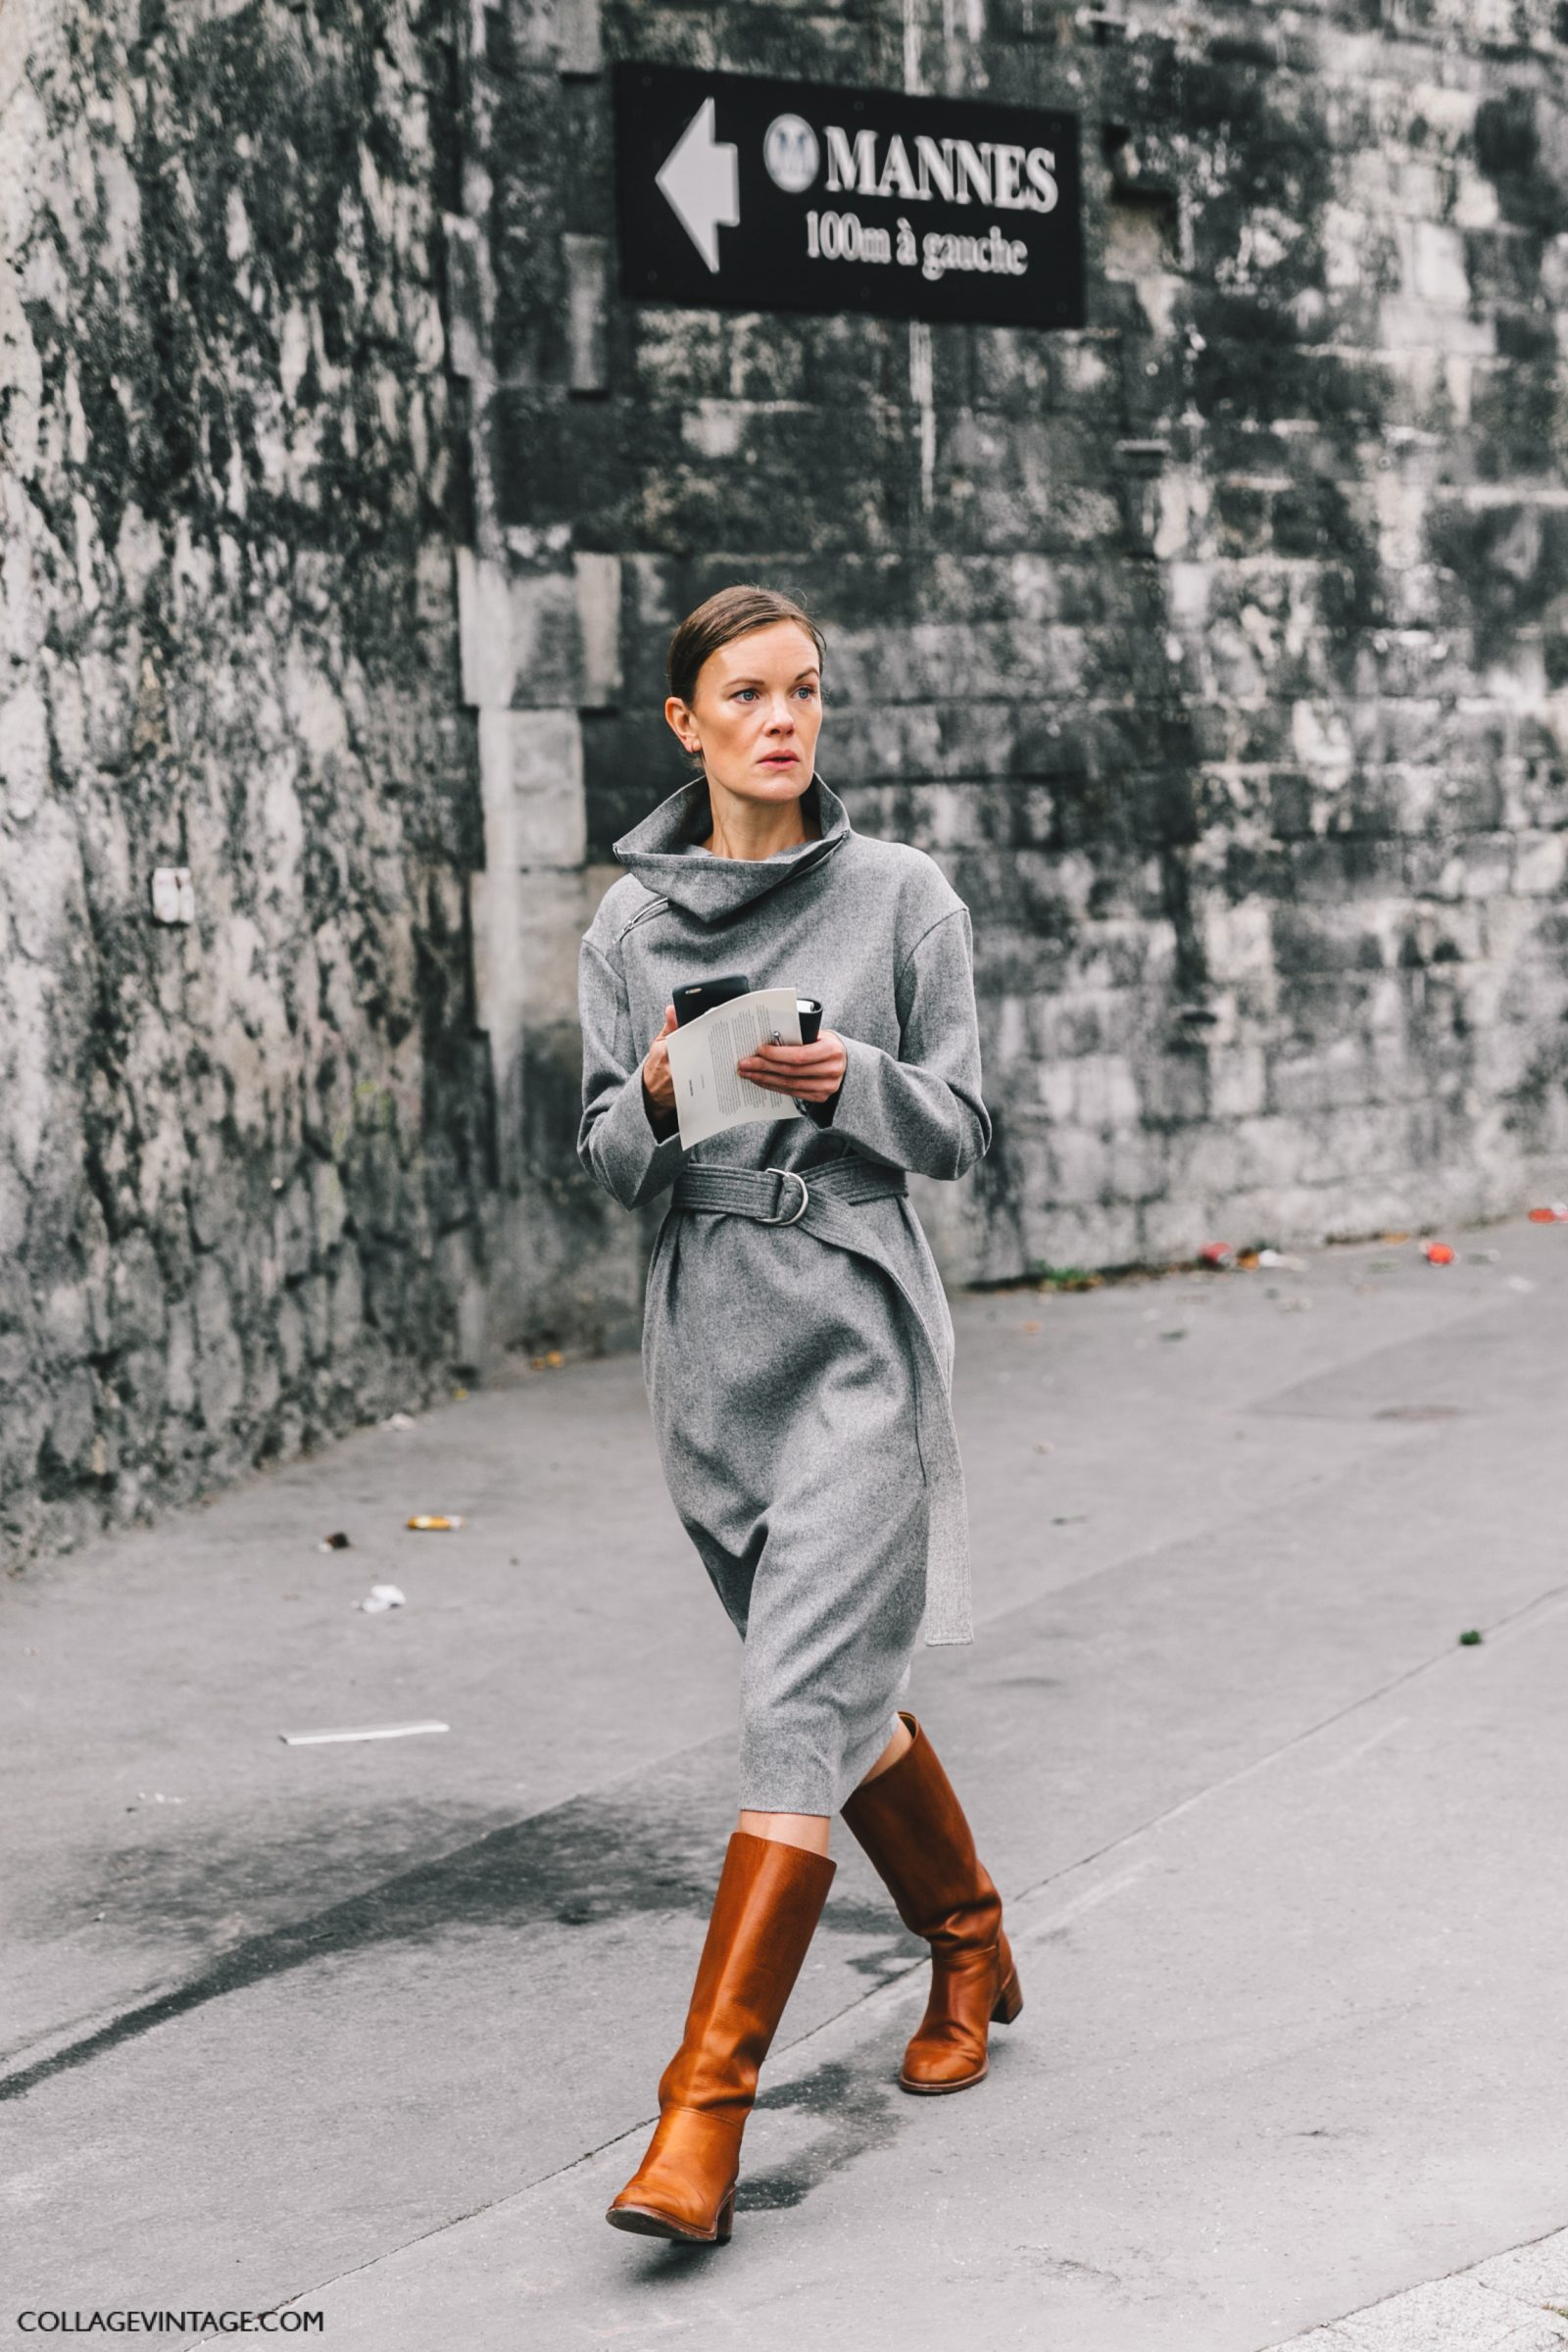 pfw-paris_fashion_week_ss17-street_style-outfits-collage_vintage-valentino-balenciaga-celine-47